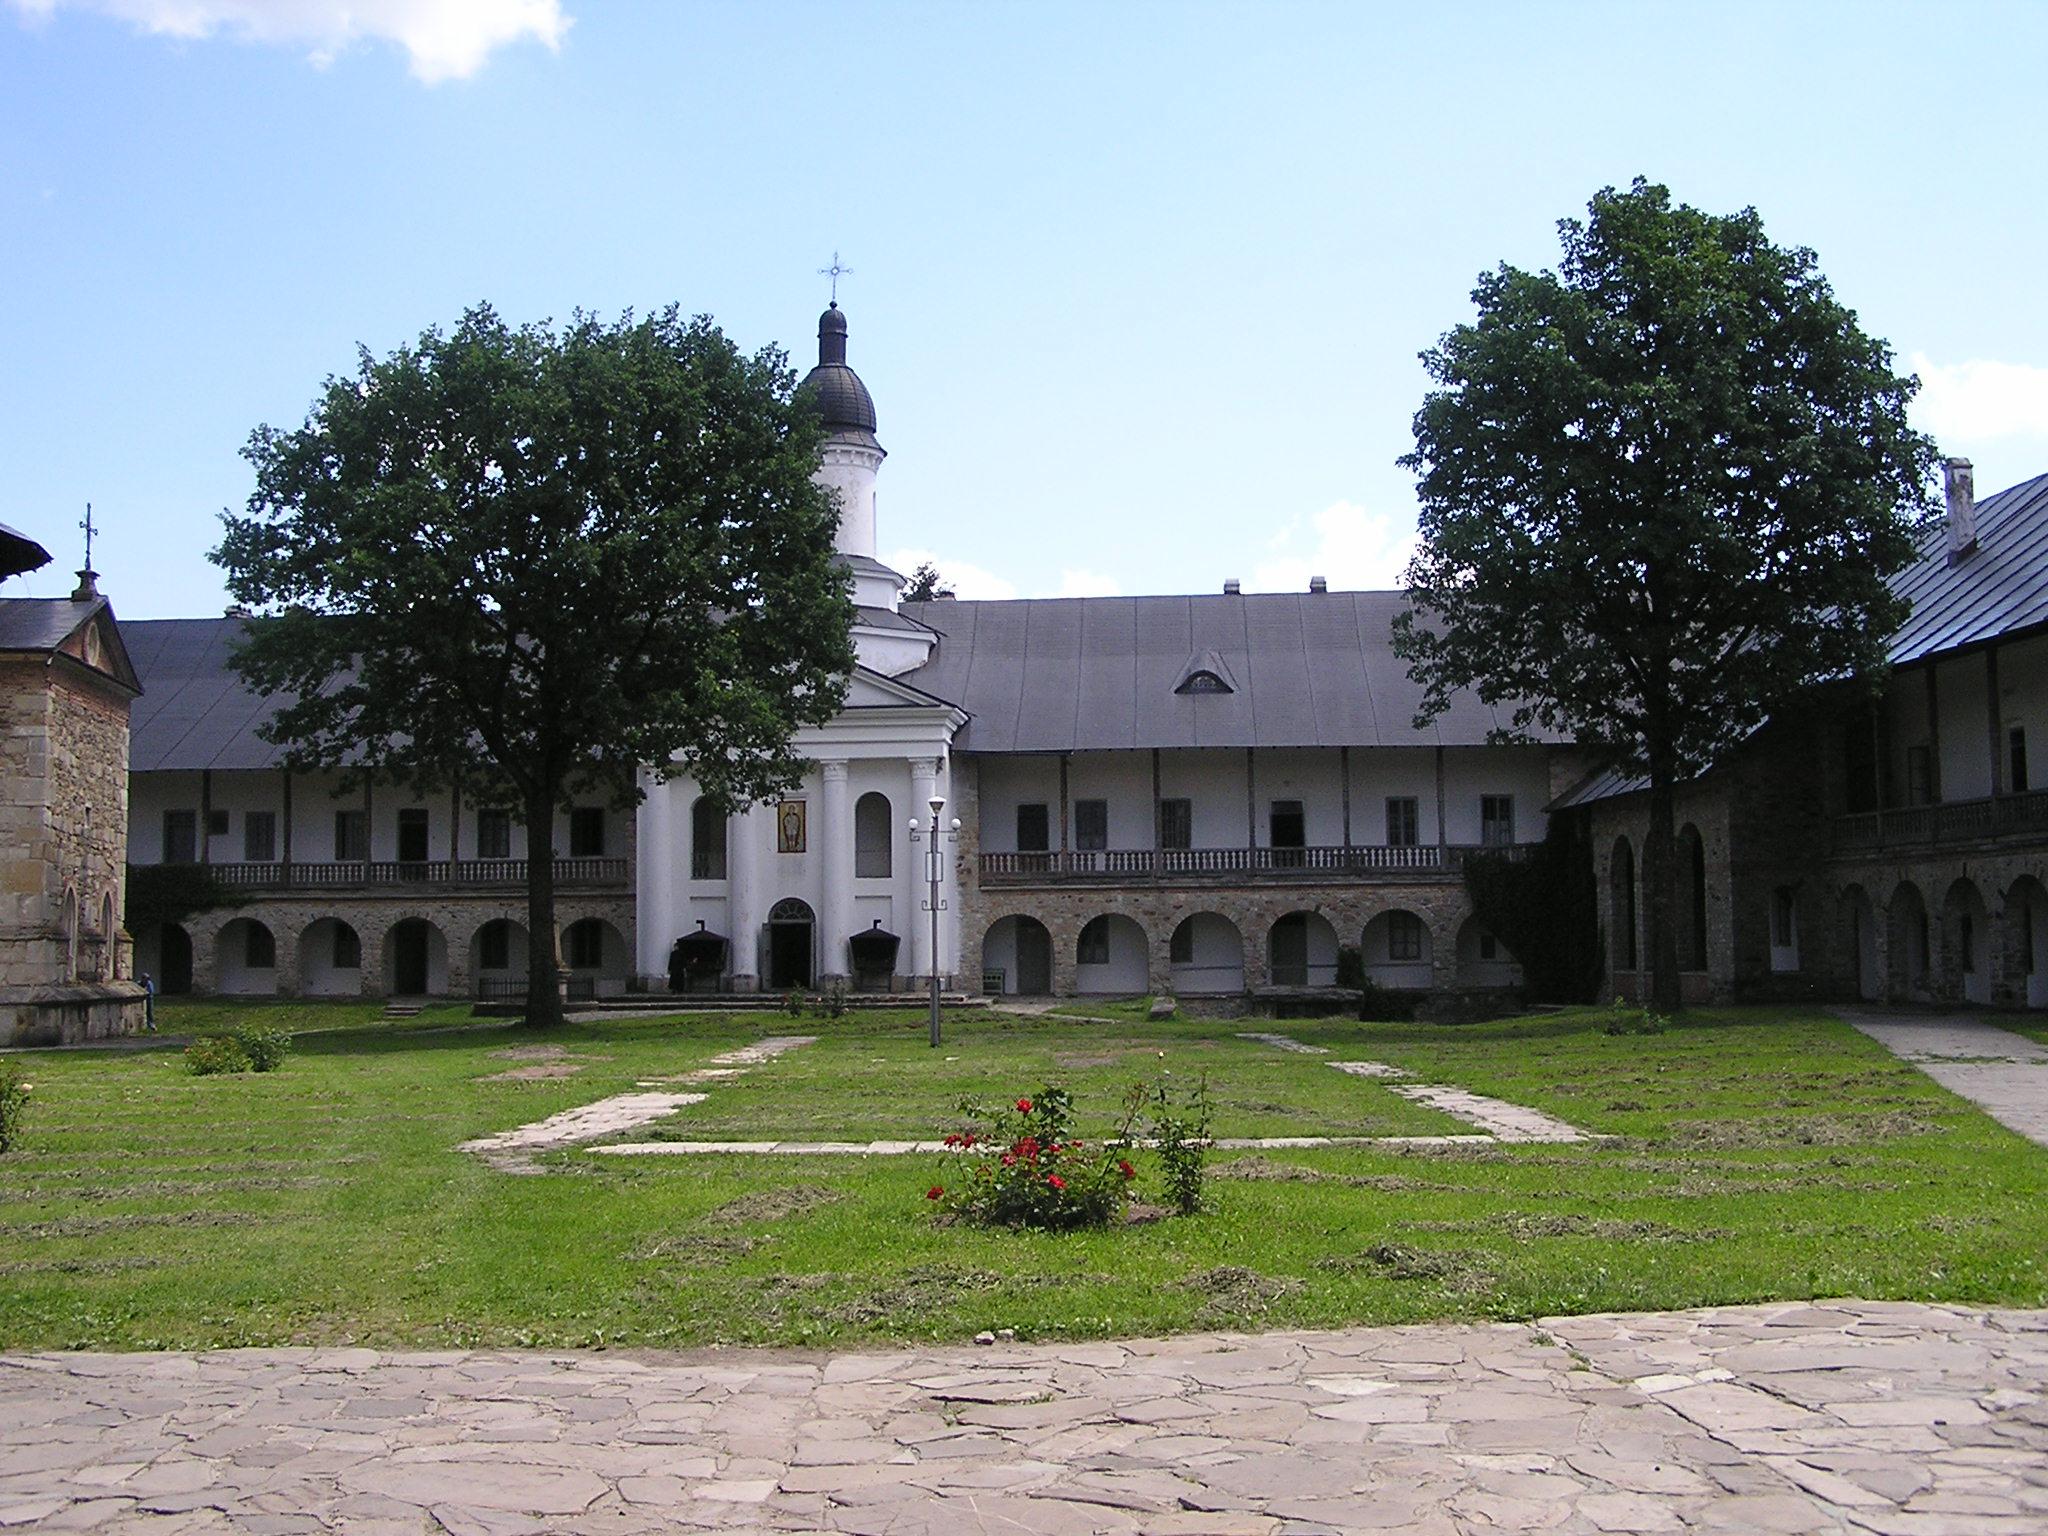 patio muralla del Monasterio Neamt Targu Neamt Rumania